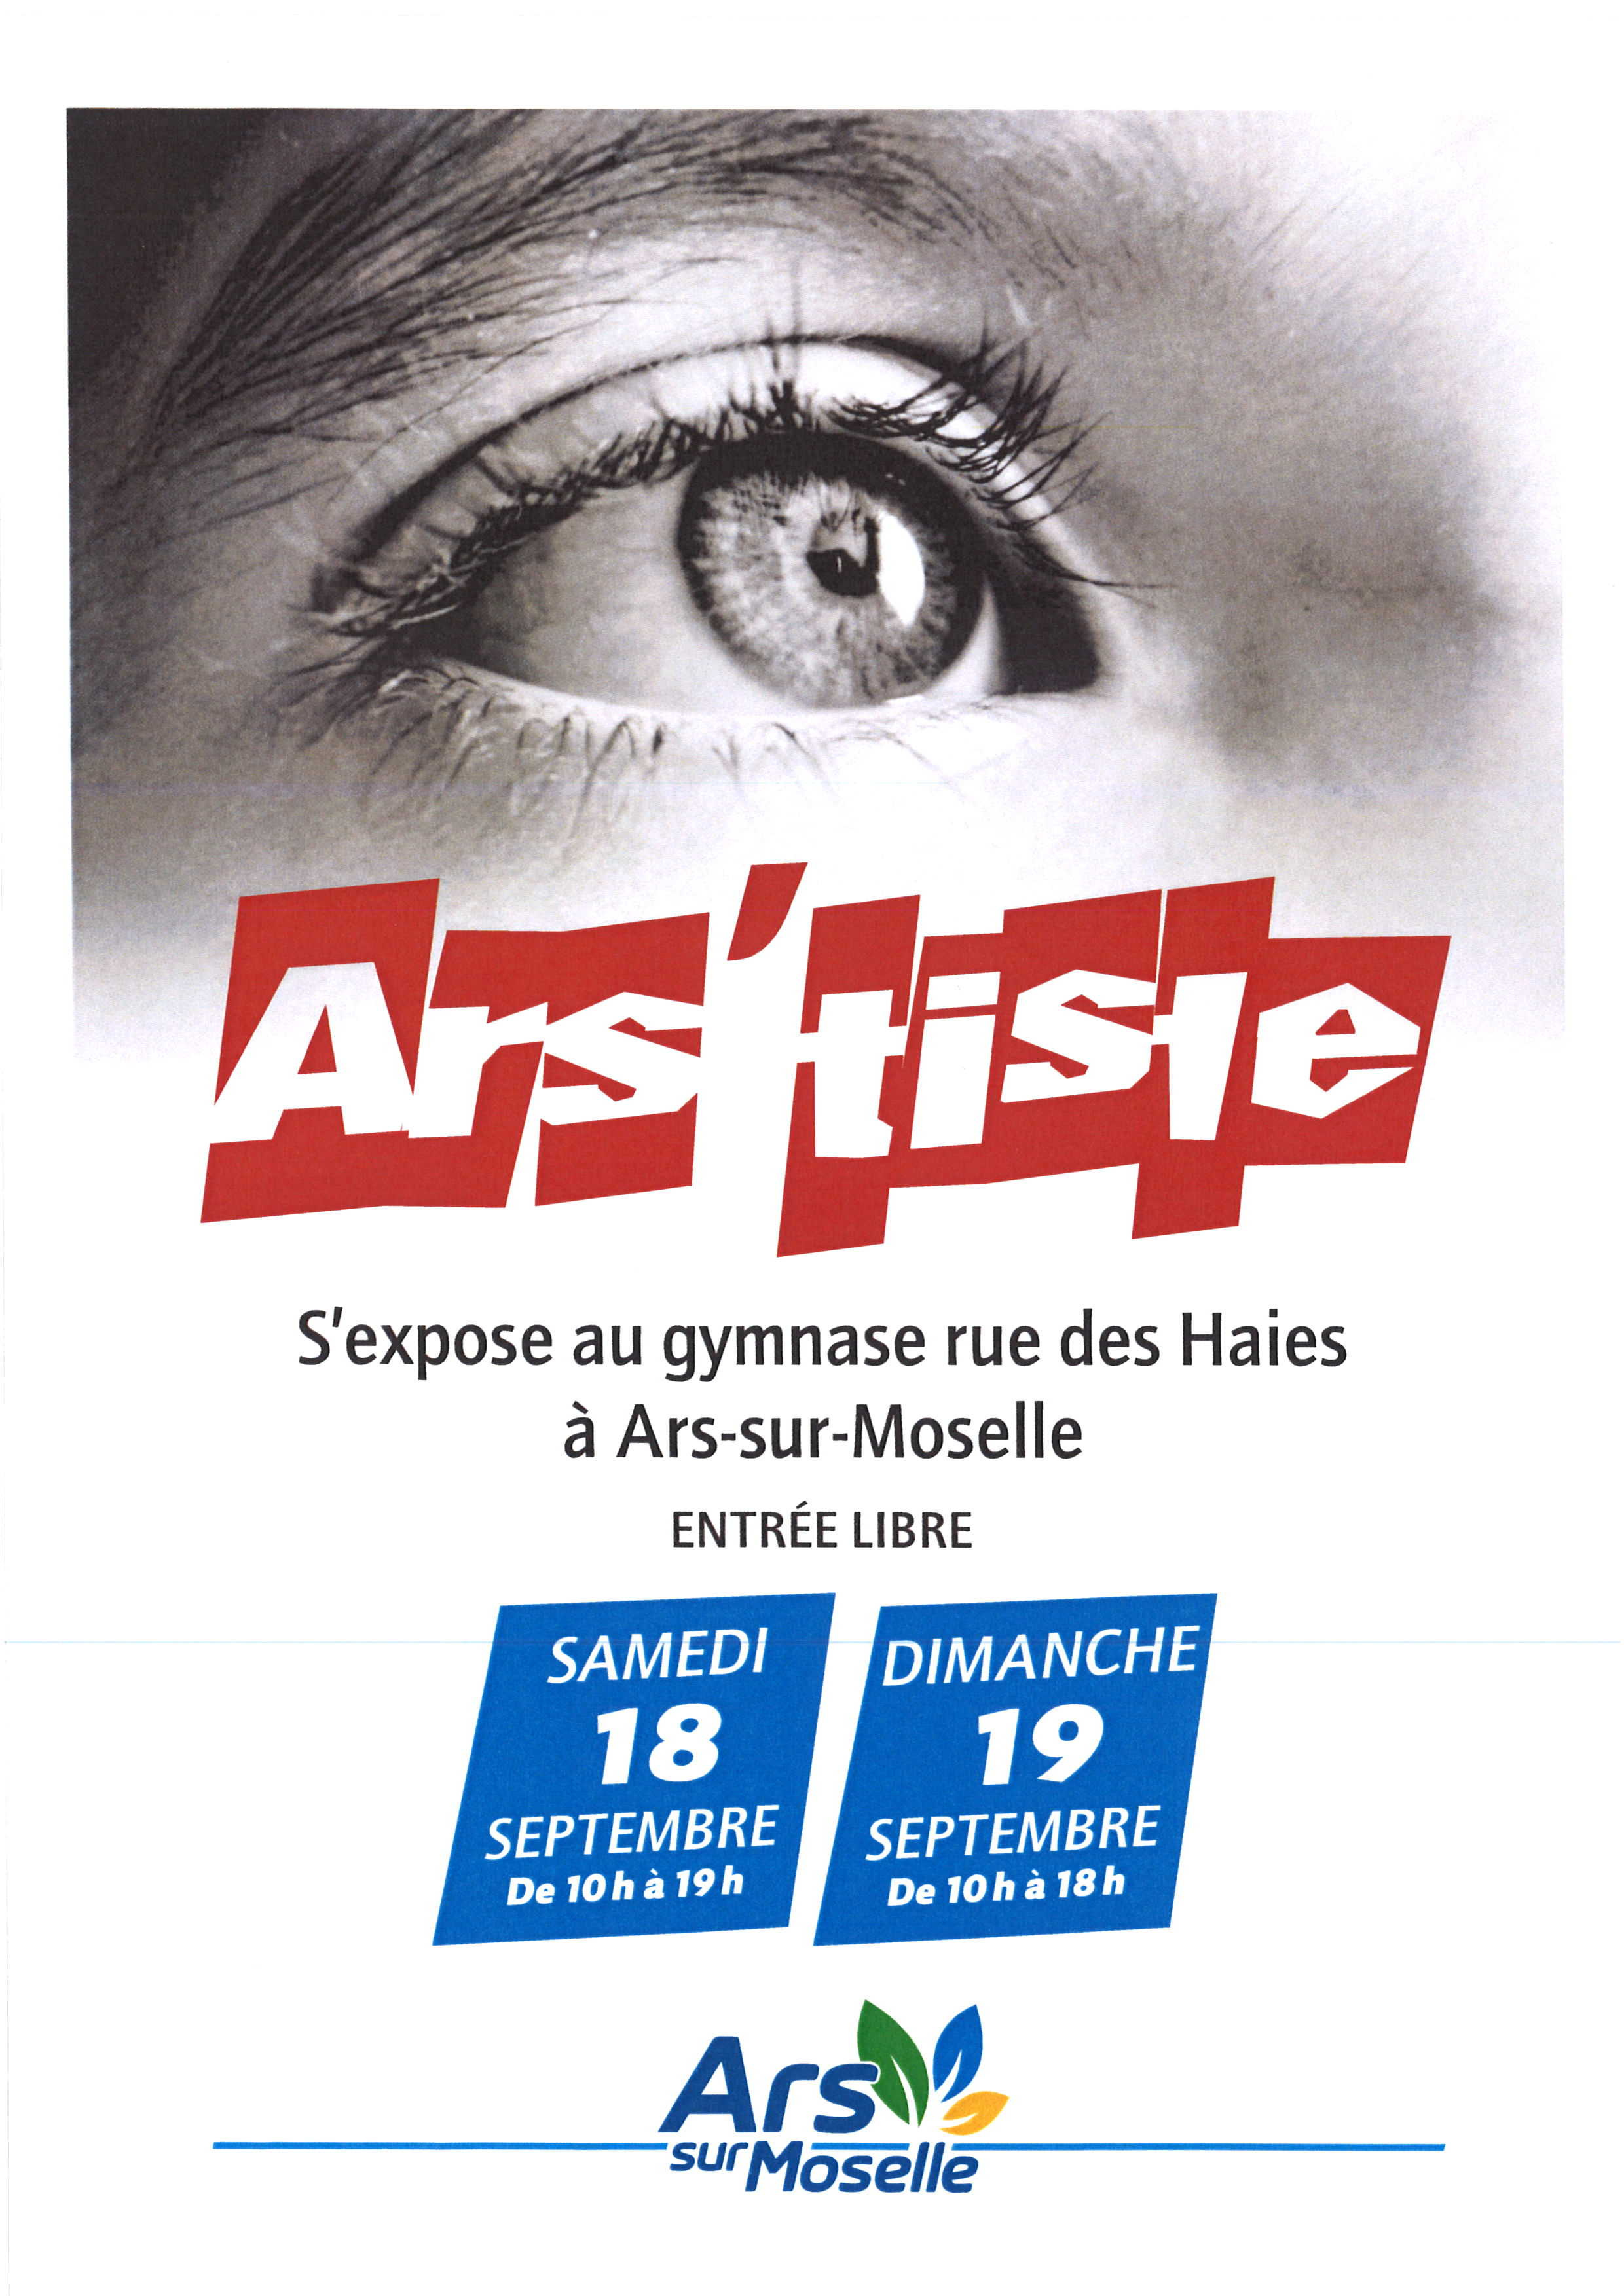 EXPO ARS'TISTE samedi 18 et dimanche 19 septembre 2021